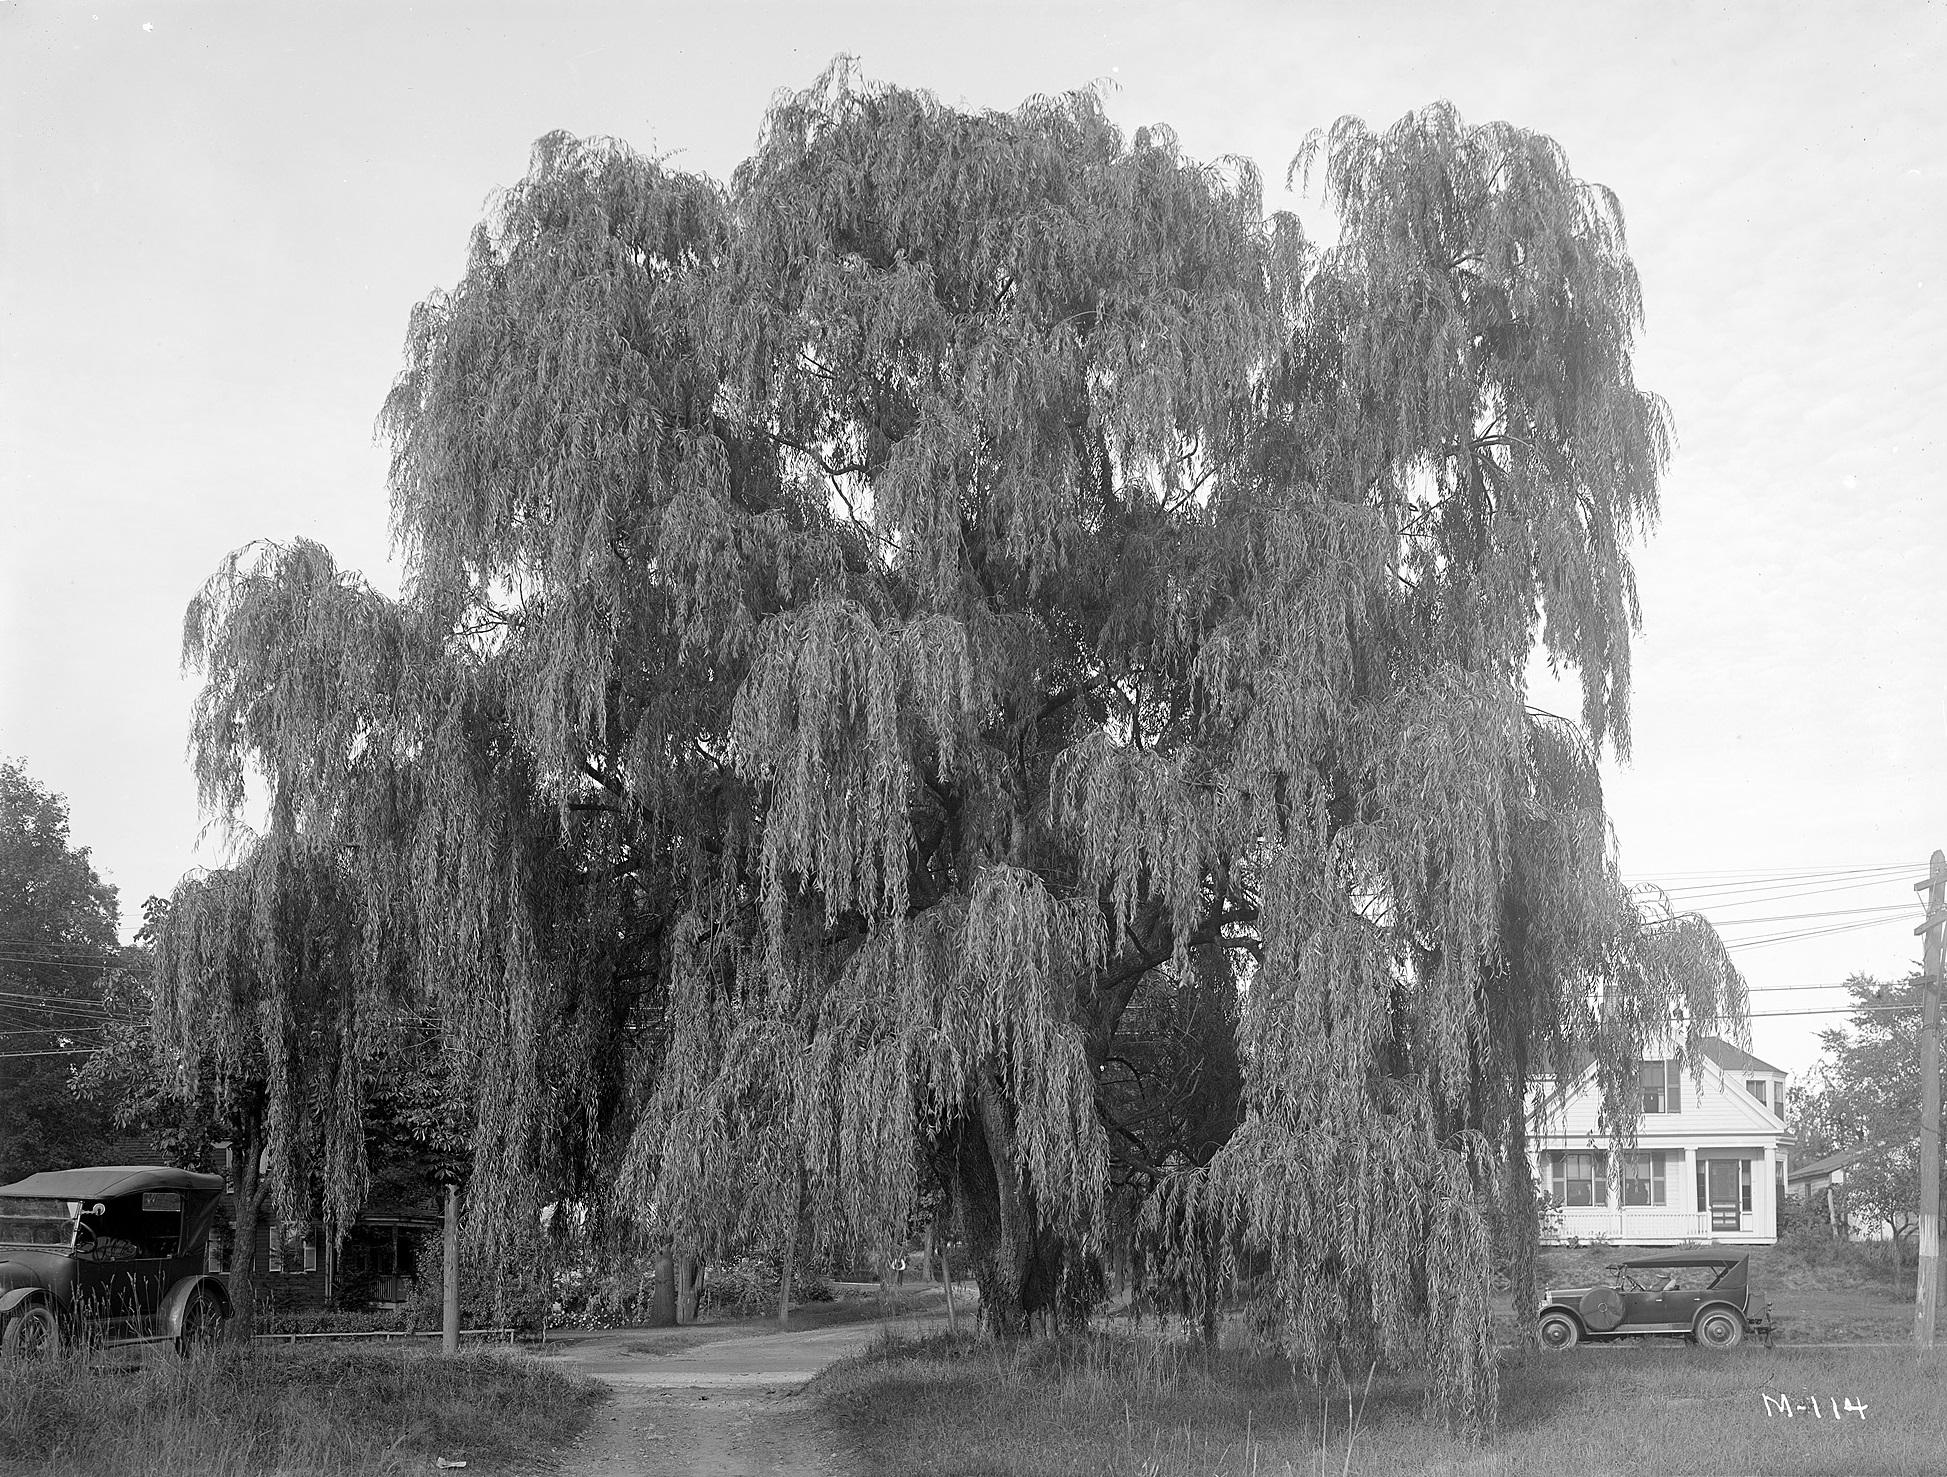 A *i*Salix blanda*/i* in Foxboro, Massachusetts.